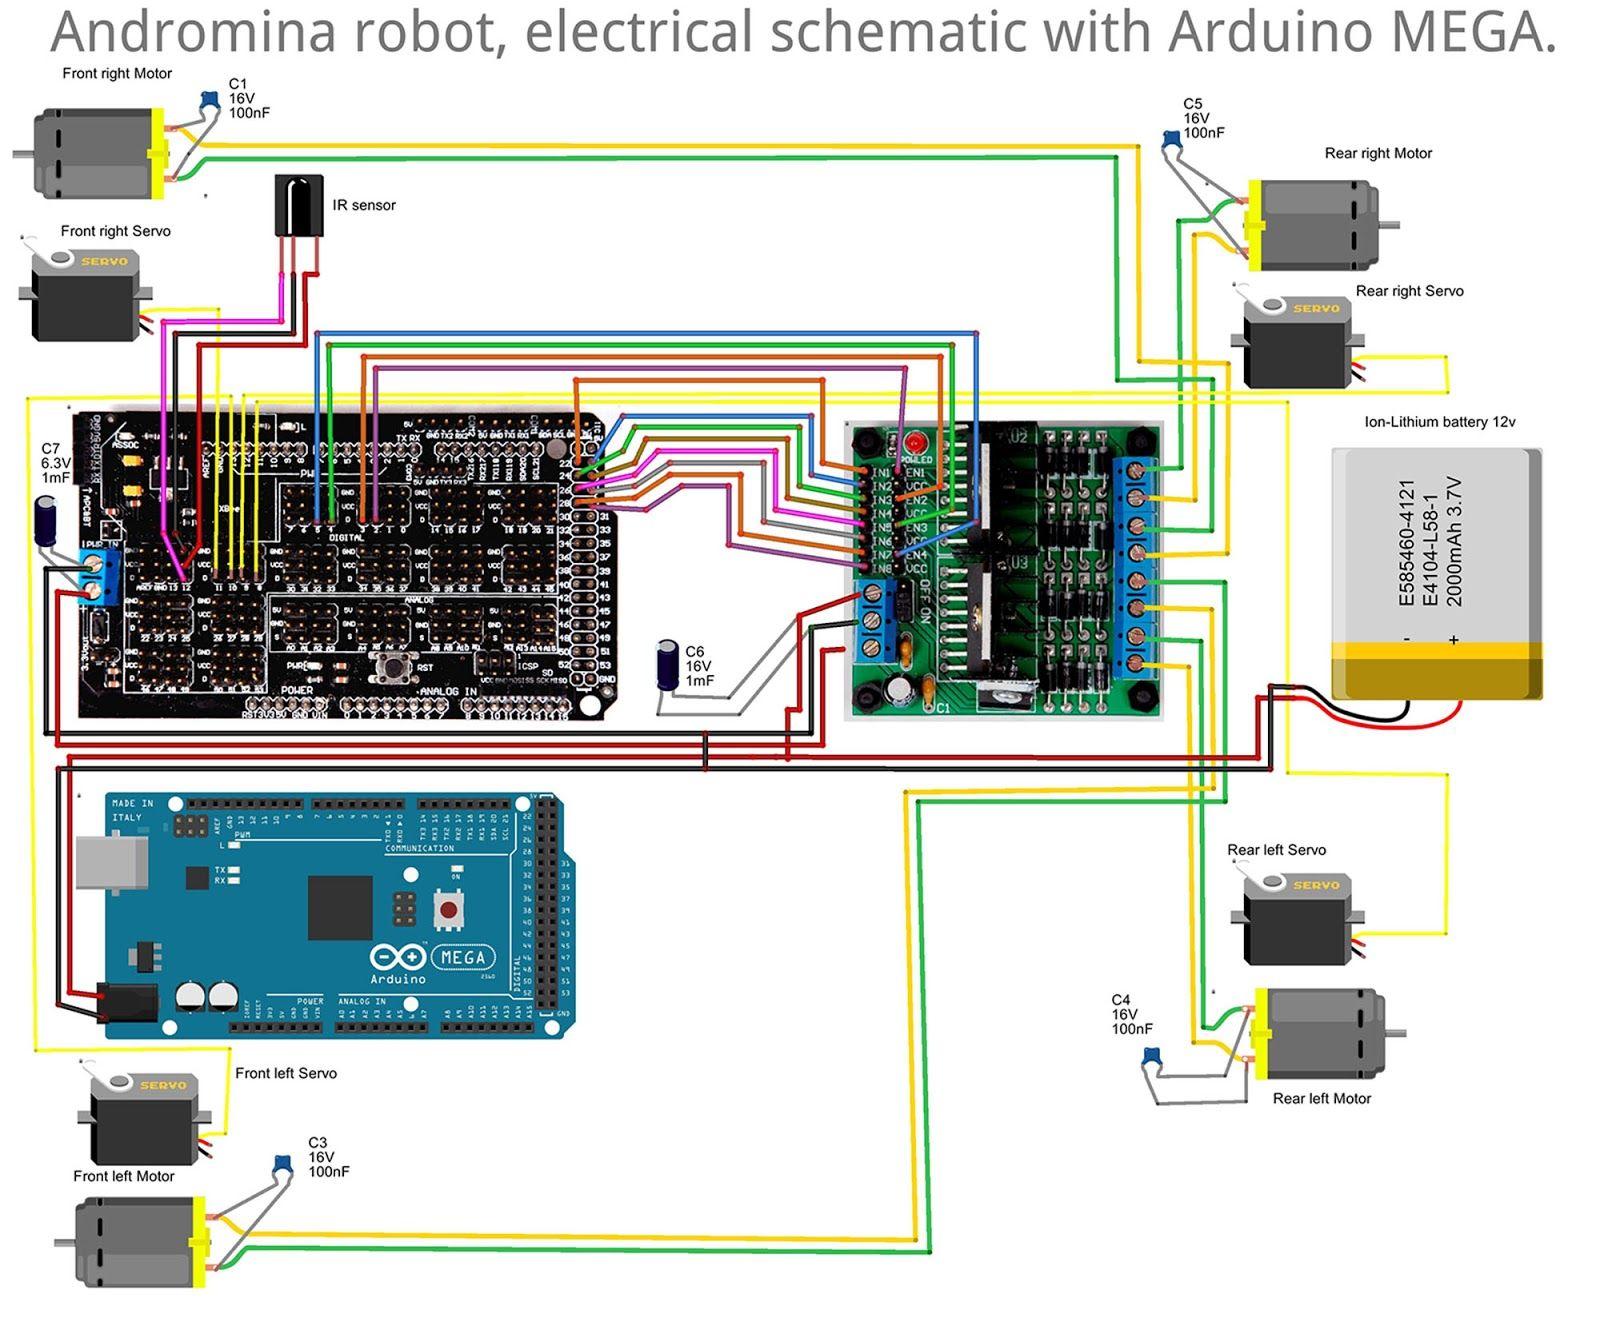 Tutorial para una placa controladora de motores L298N compatible con Arduino, Raspberry Pi, PICAXE, ROS o cualquier platafroma libre.